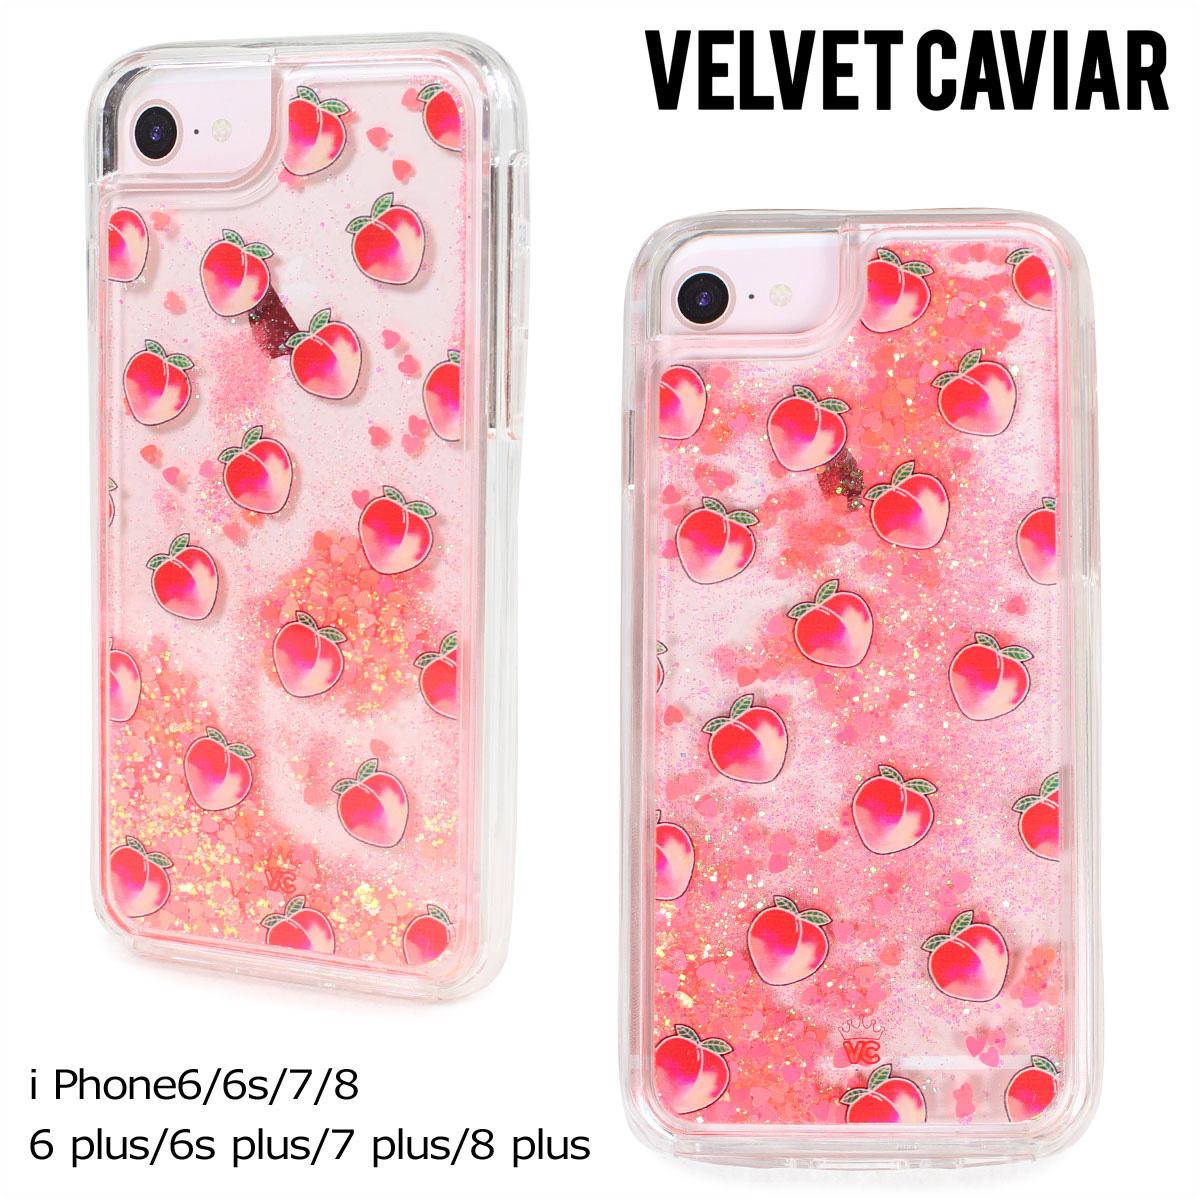 bc36c6562e VelvetCaviarヴェルヴェットキャビアiPhone8iPhone78Plus7Plus6s6ケーススマホiPhoneケース アイフォンアイフォーンベルベットPEACHIPHONECASEレディースピンク[10